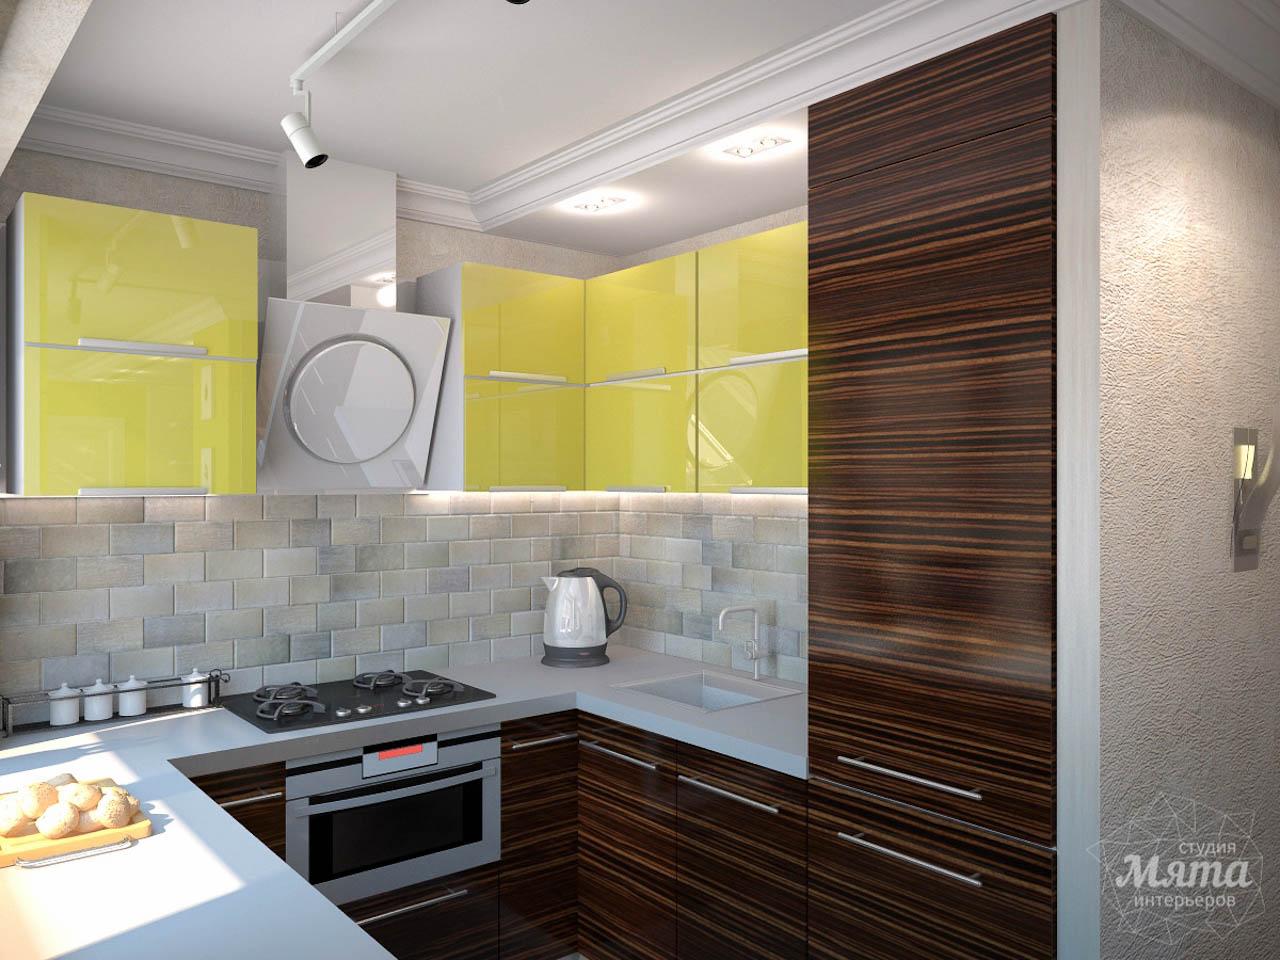 Дизайн интерьера двухкомнатной квартиры по ул. Комсомольская 14 img1393372845